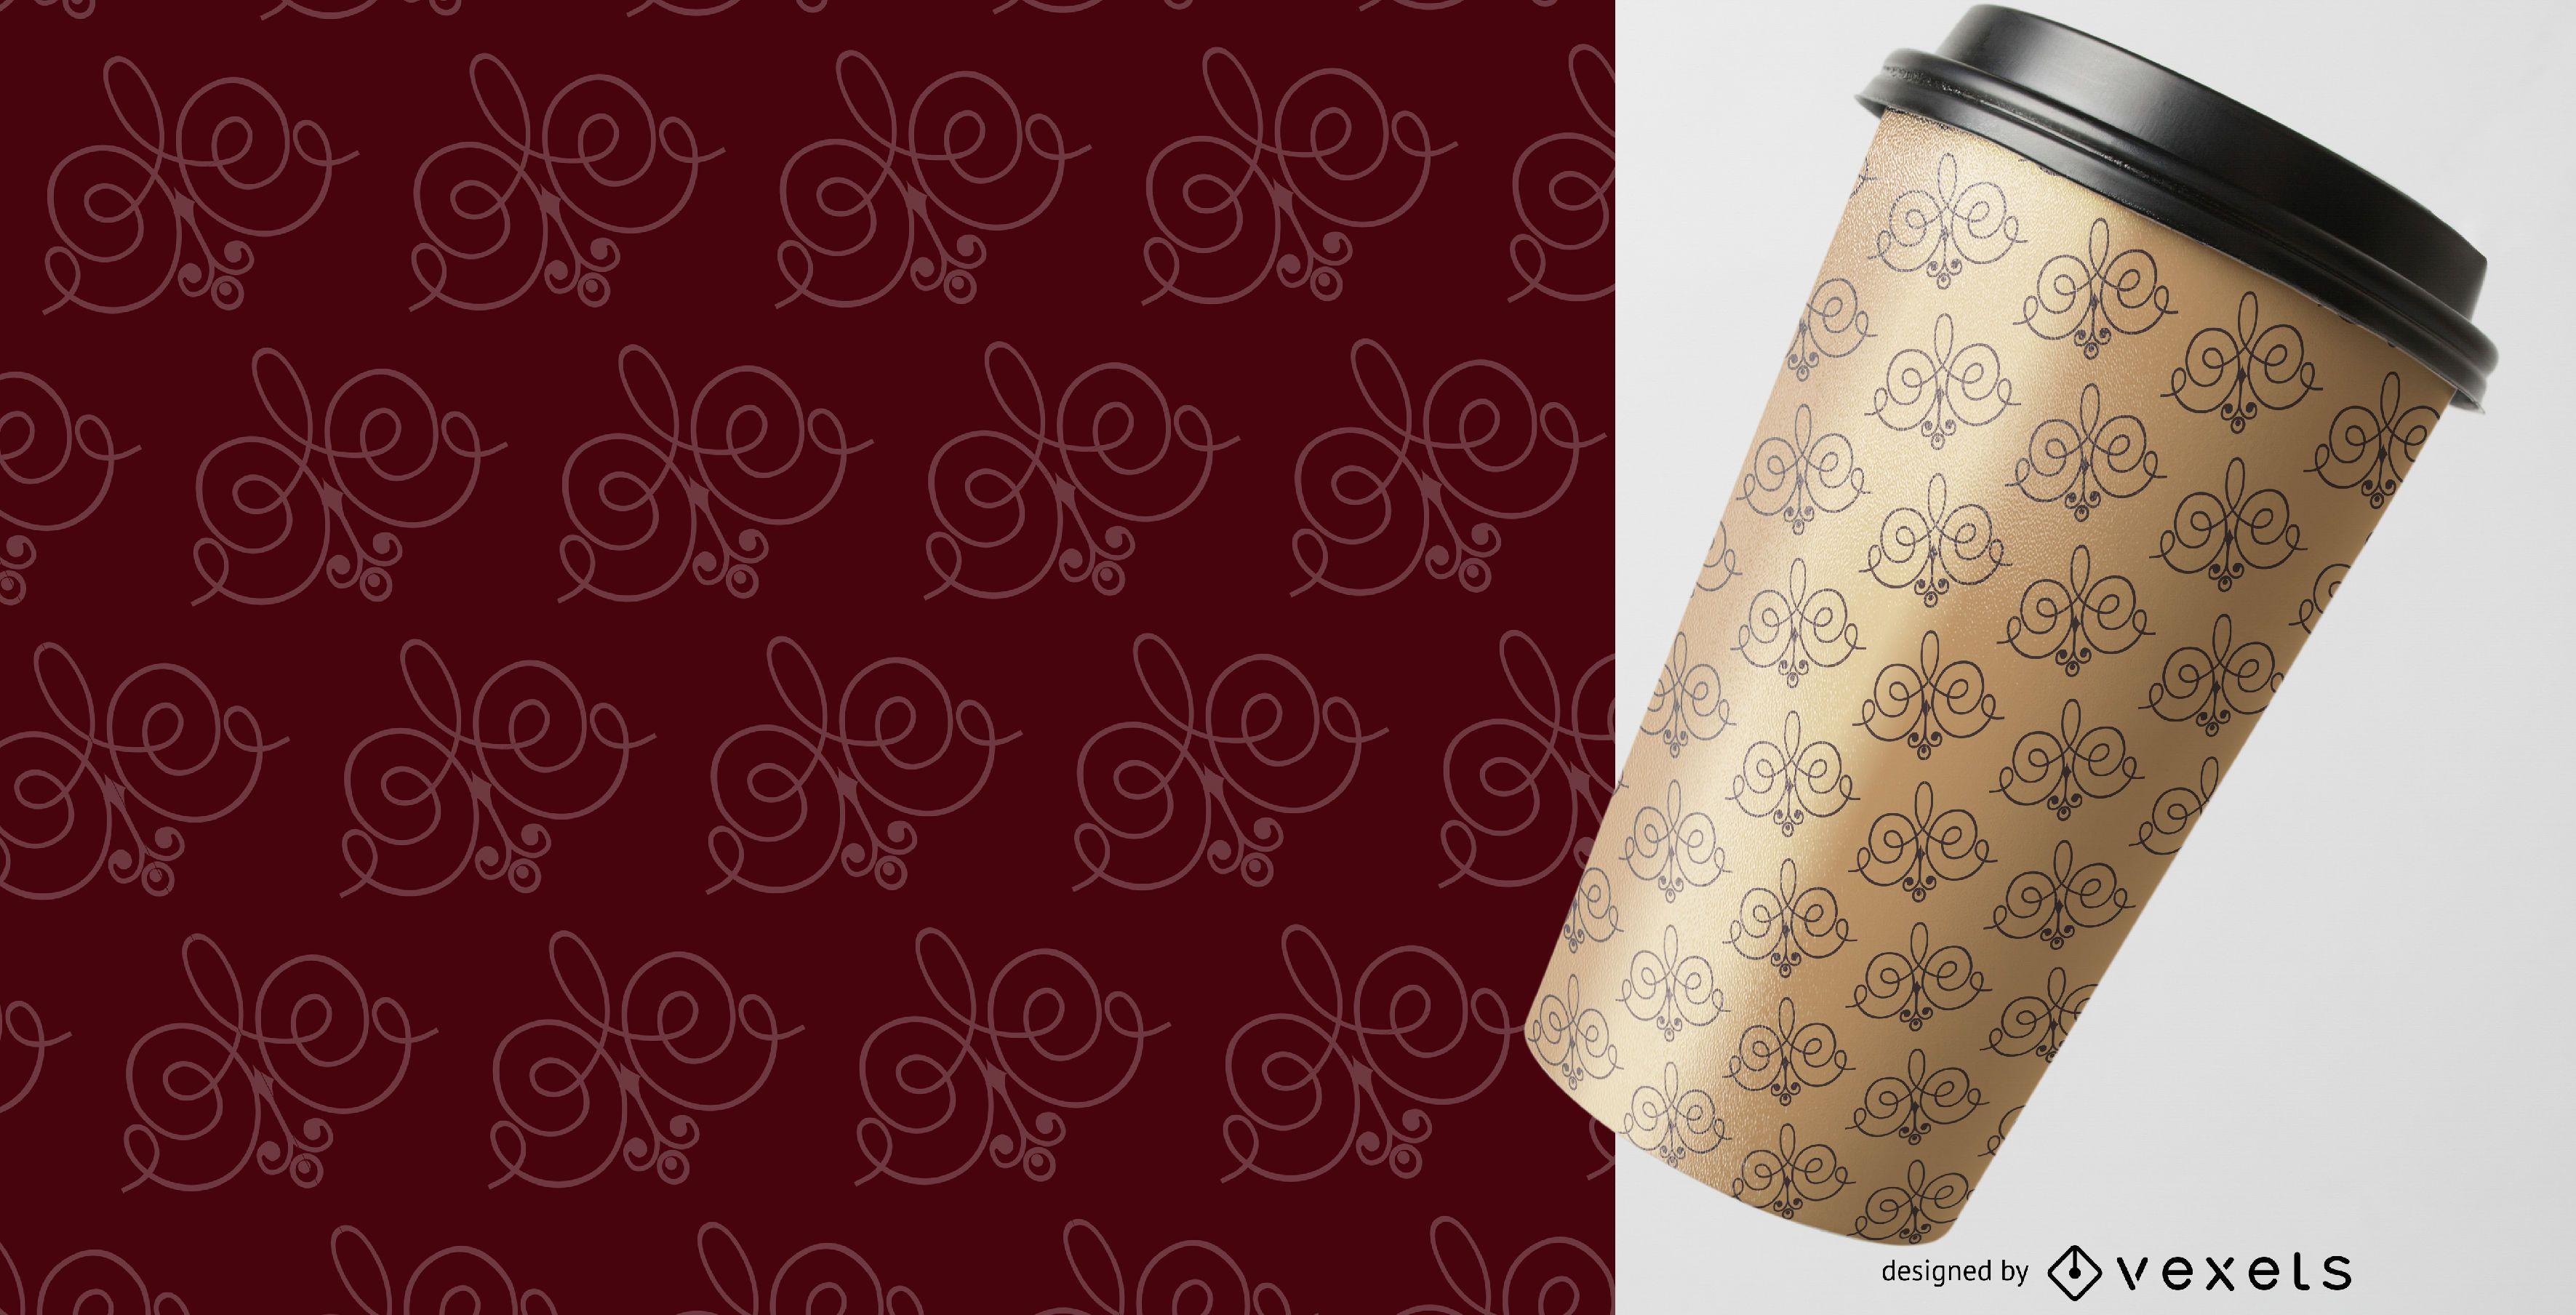 Elegant detailed ornaments pattern